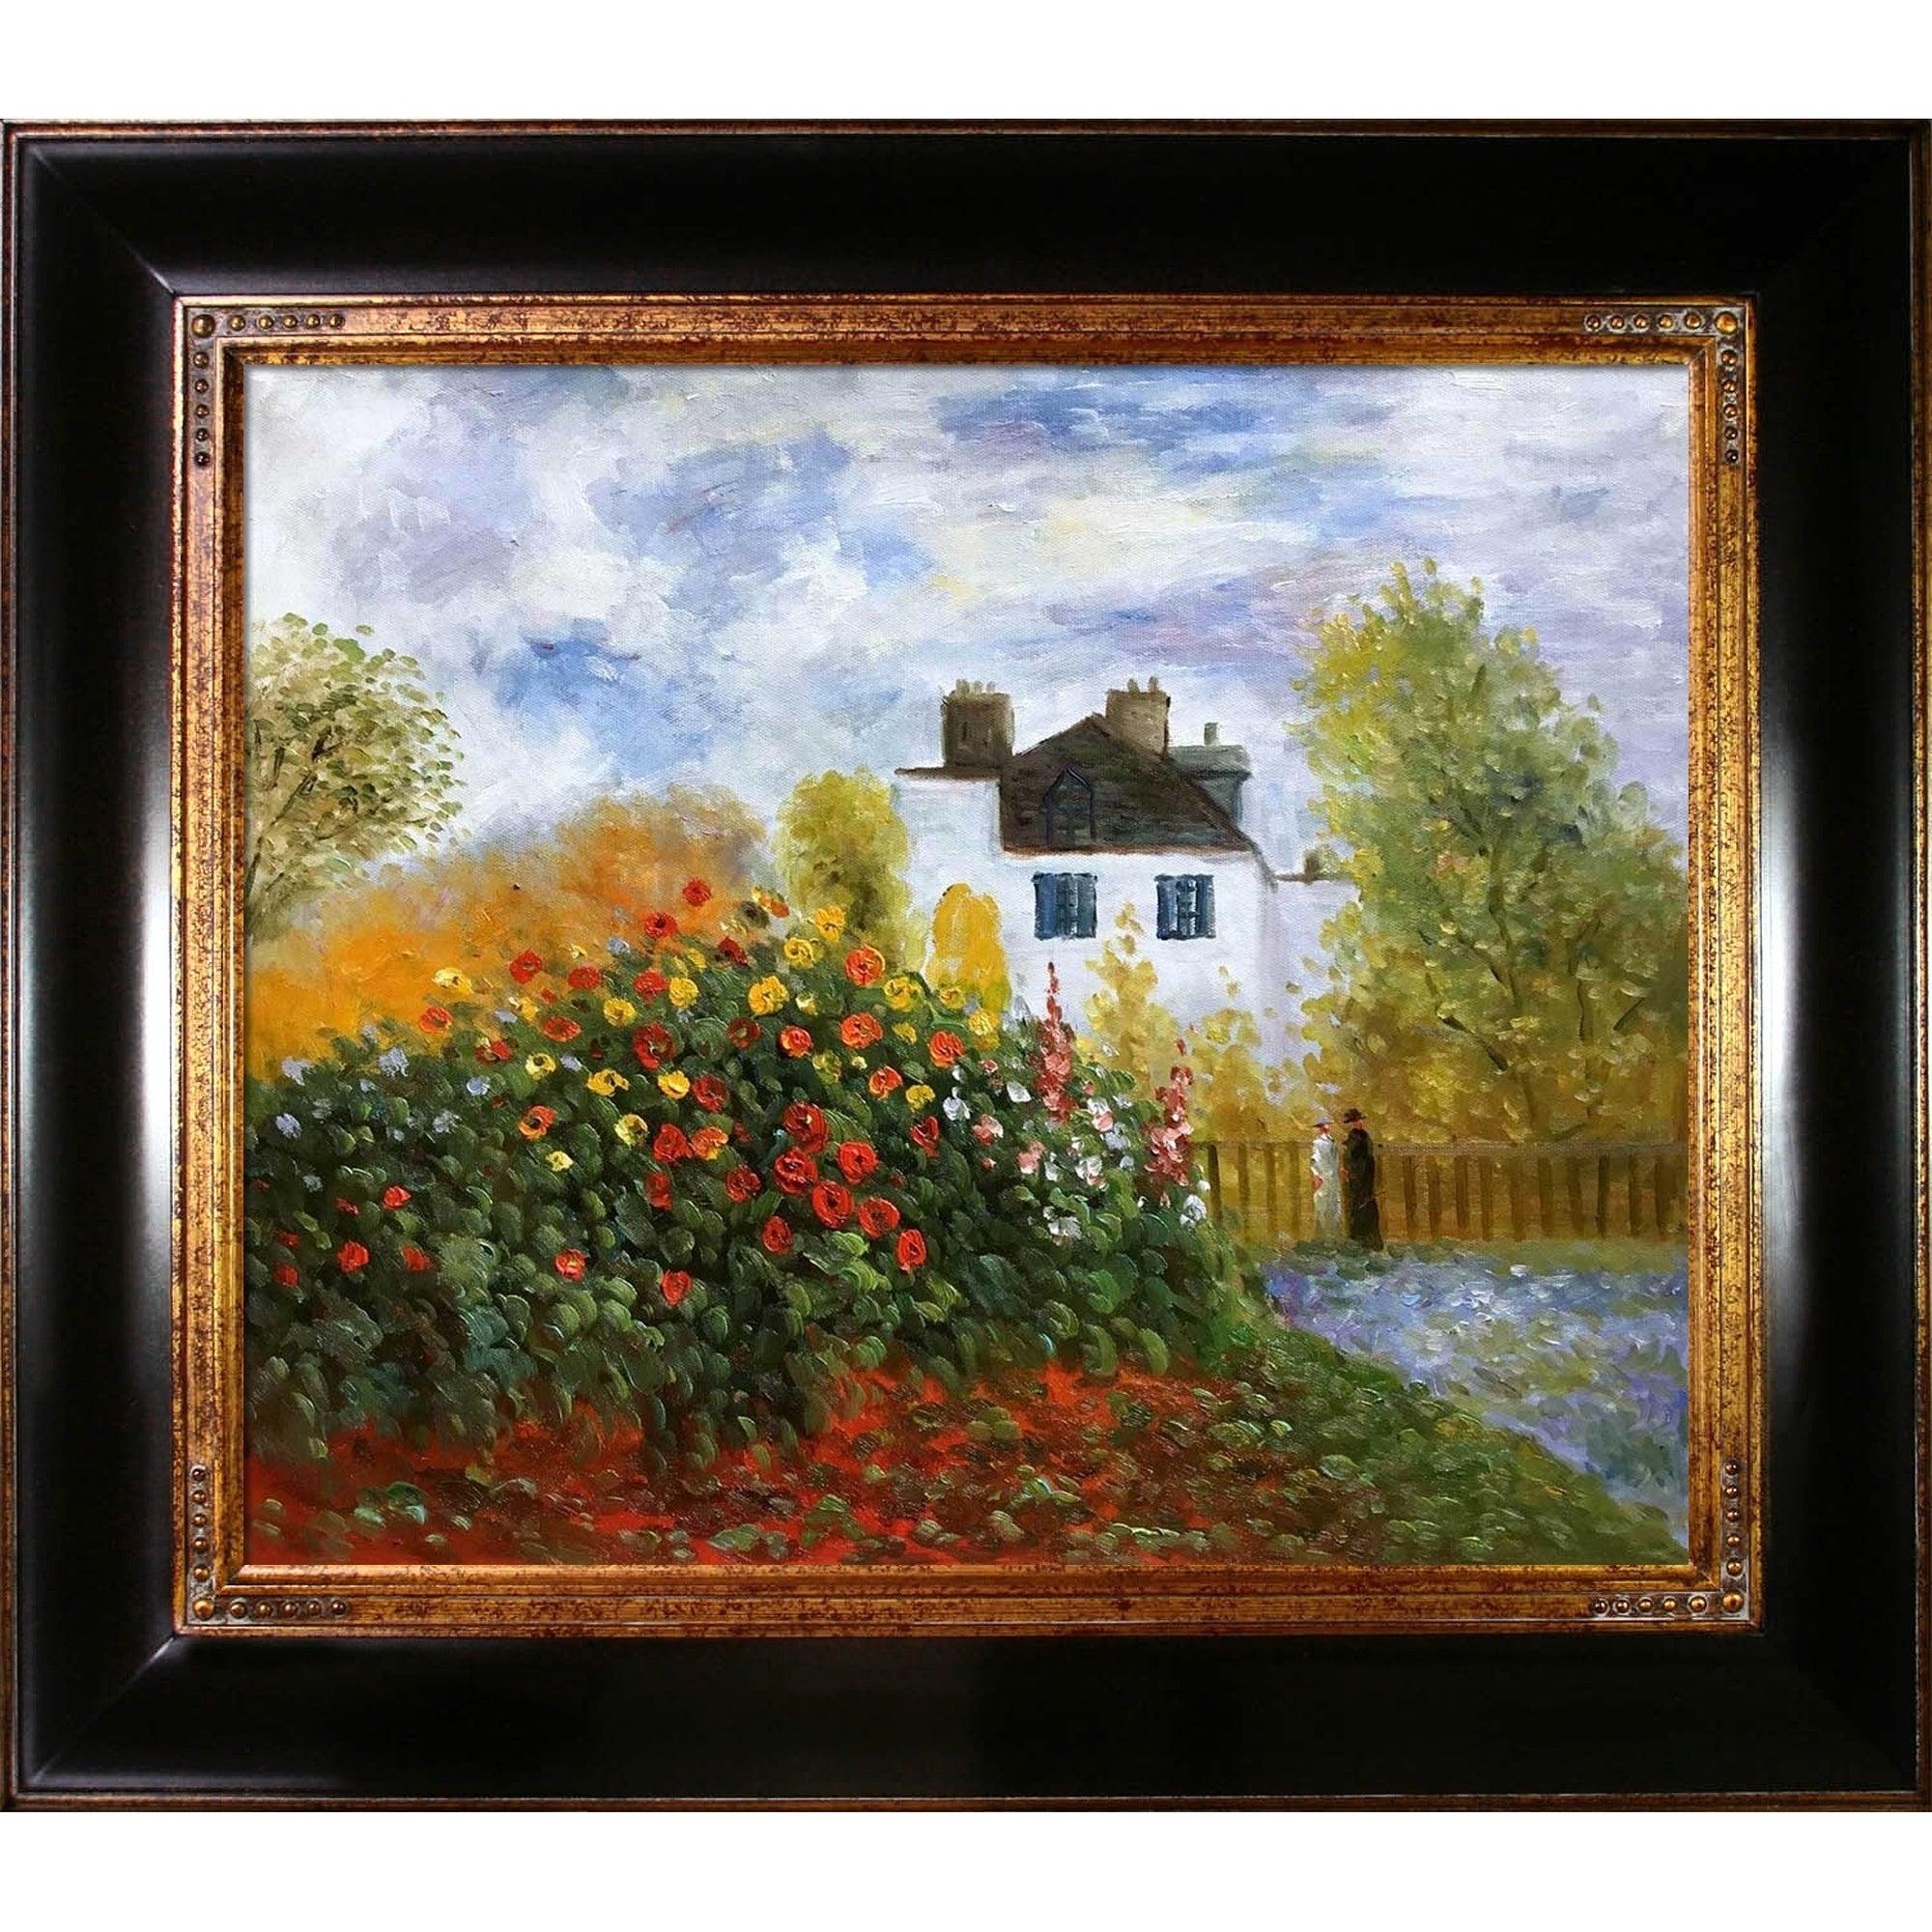 Claude Monet The Garden of Monet Hand Painted Oil Reproduction fee2198b e2f2 4898 b36b b e88